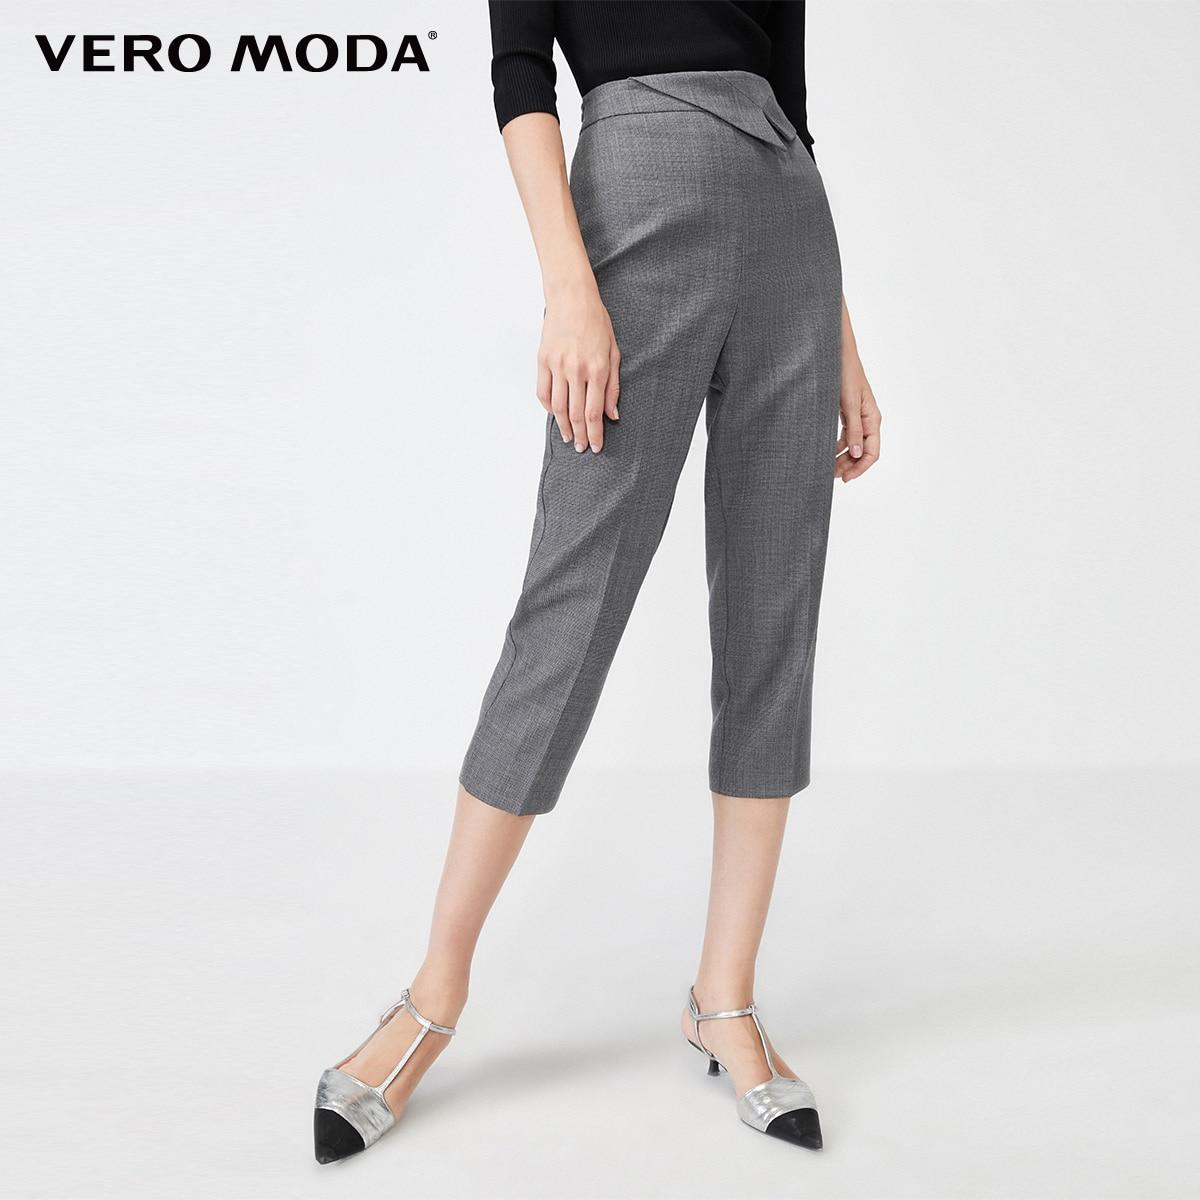 Vero Moda Women's OL WooL Decorative Waist Seal Side Zipper Capri Pants | 31936J524